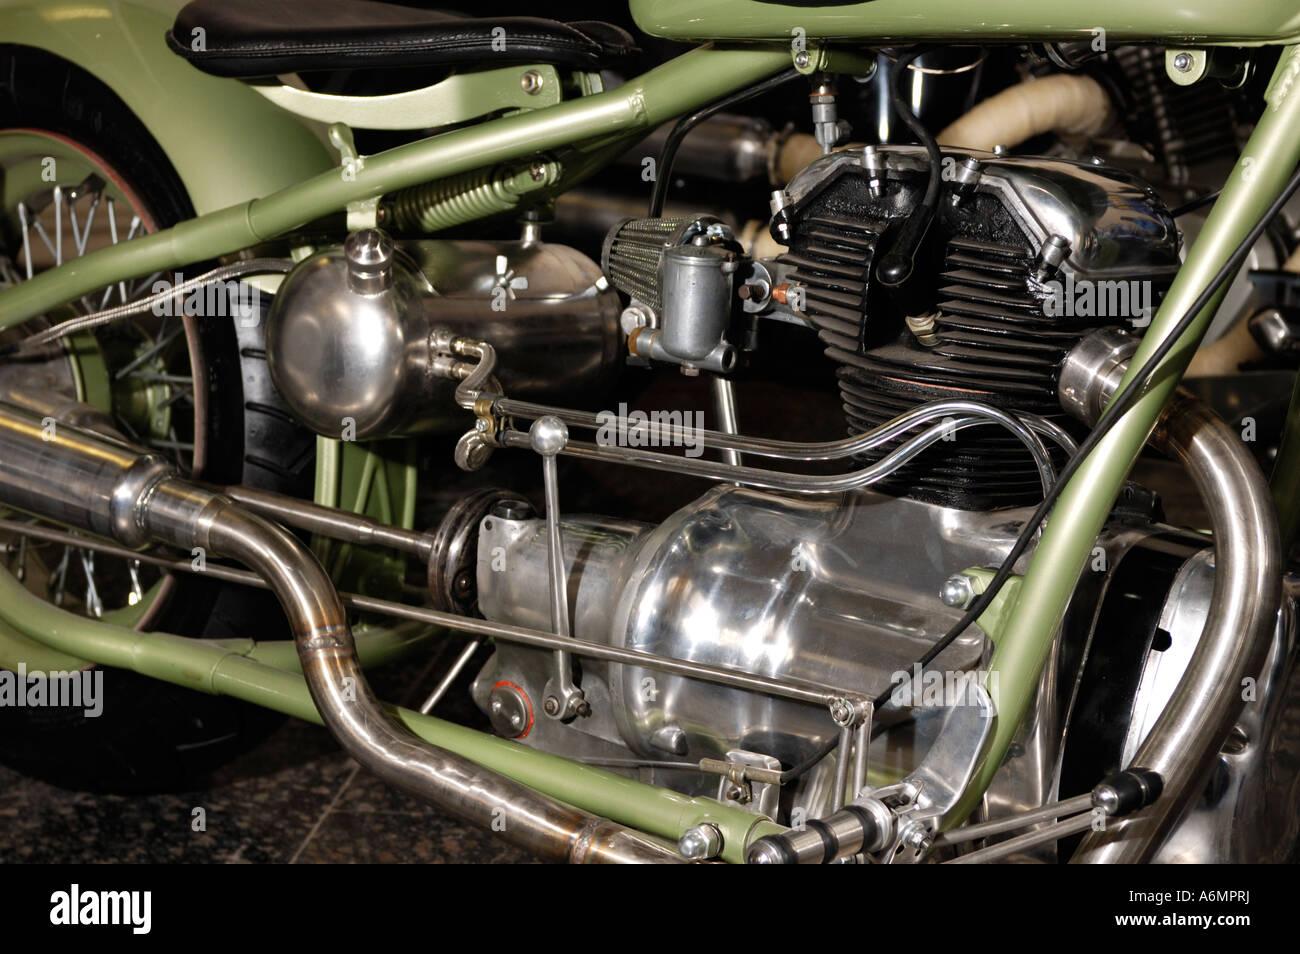 Lowrider motorcycle engine - Stock Image